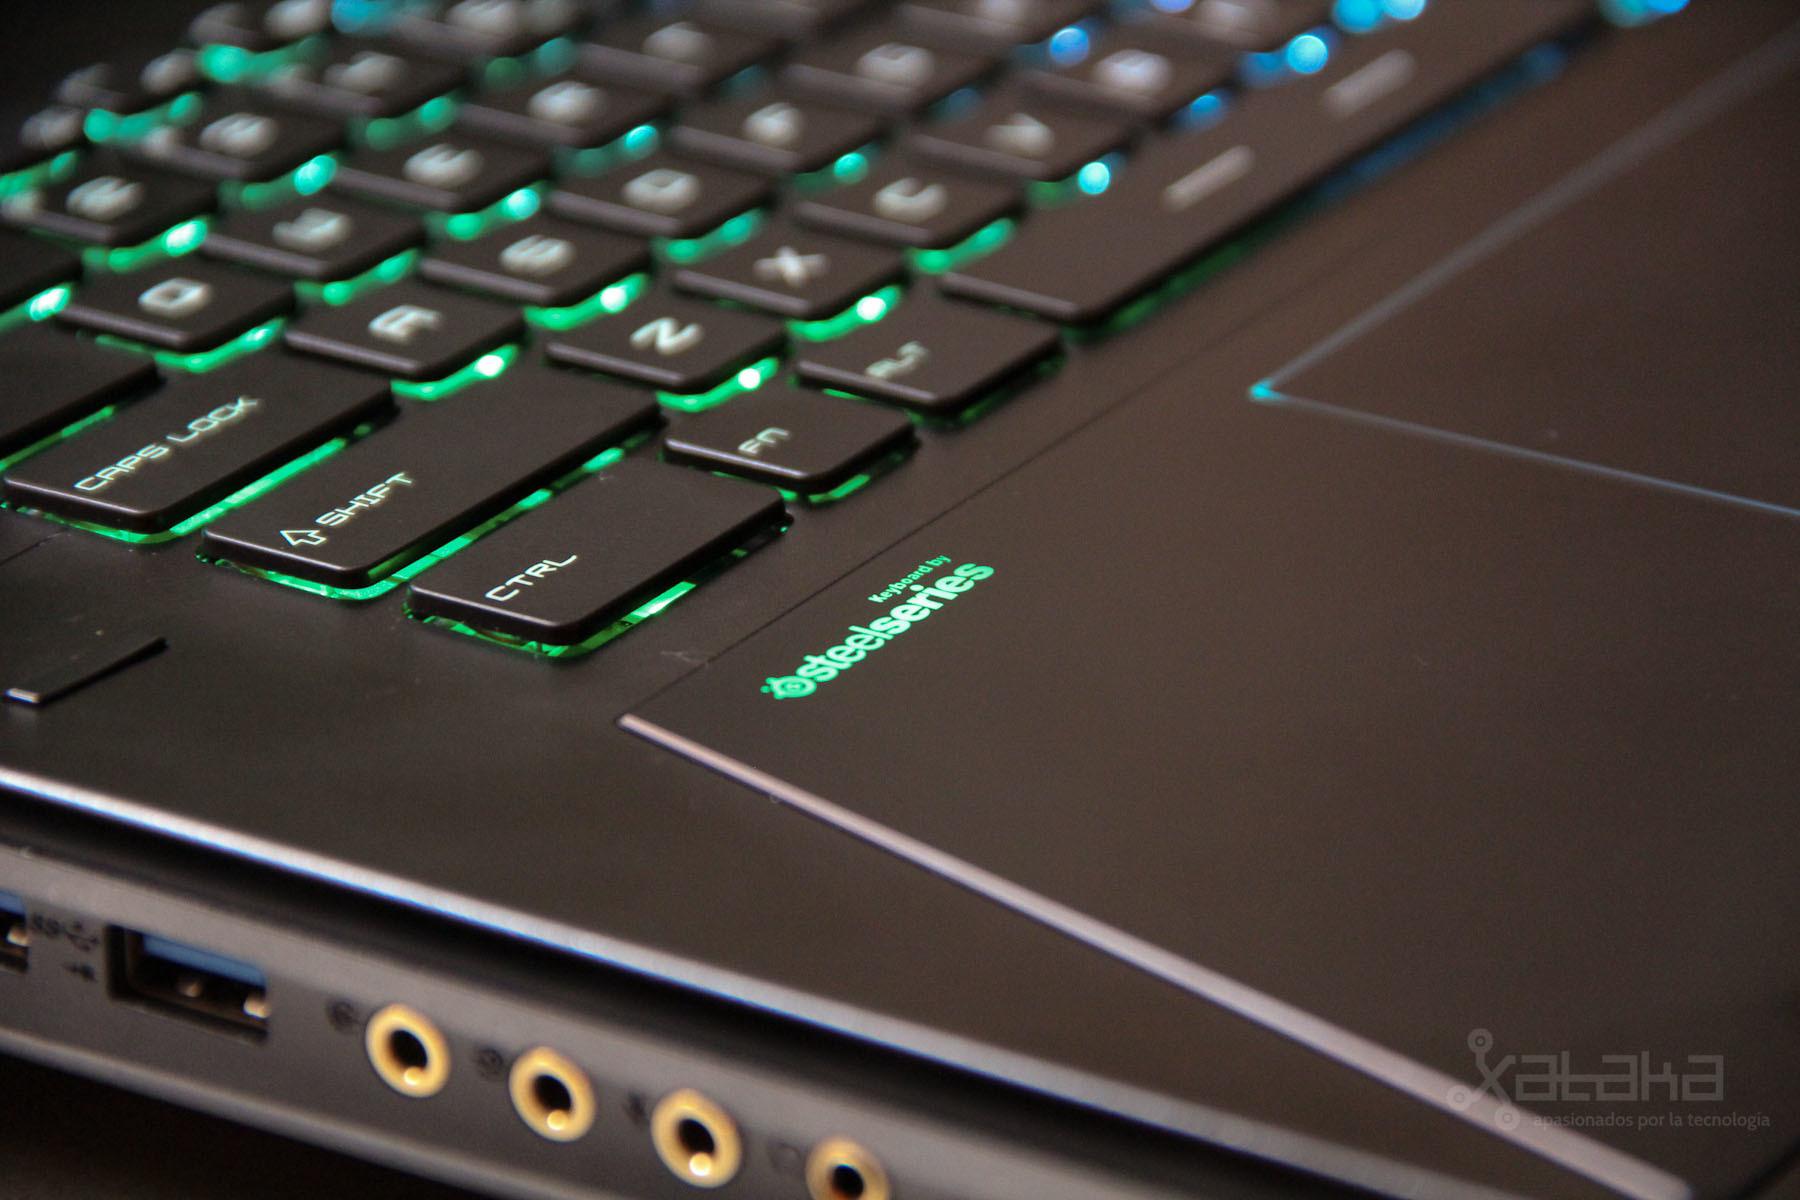 MSI GT72 'Dominator Pro', toma de contacto